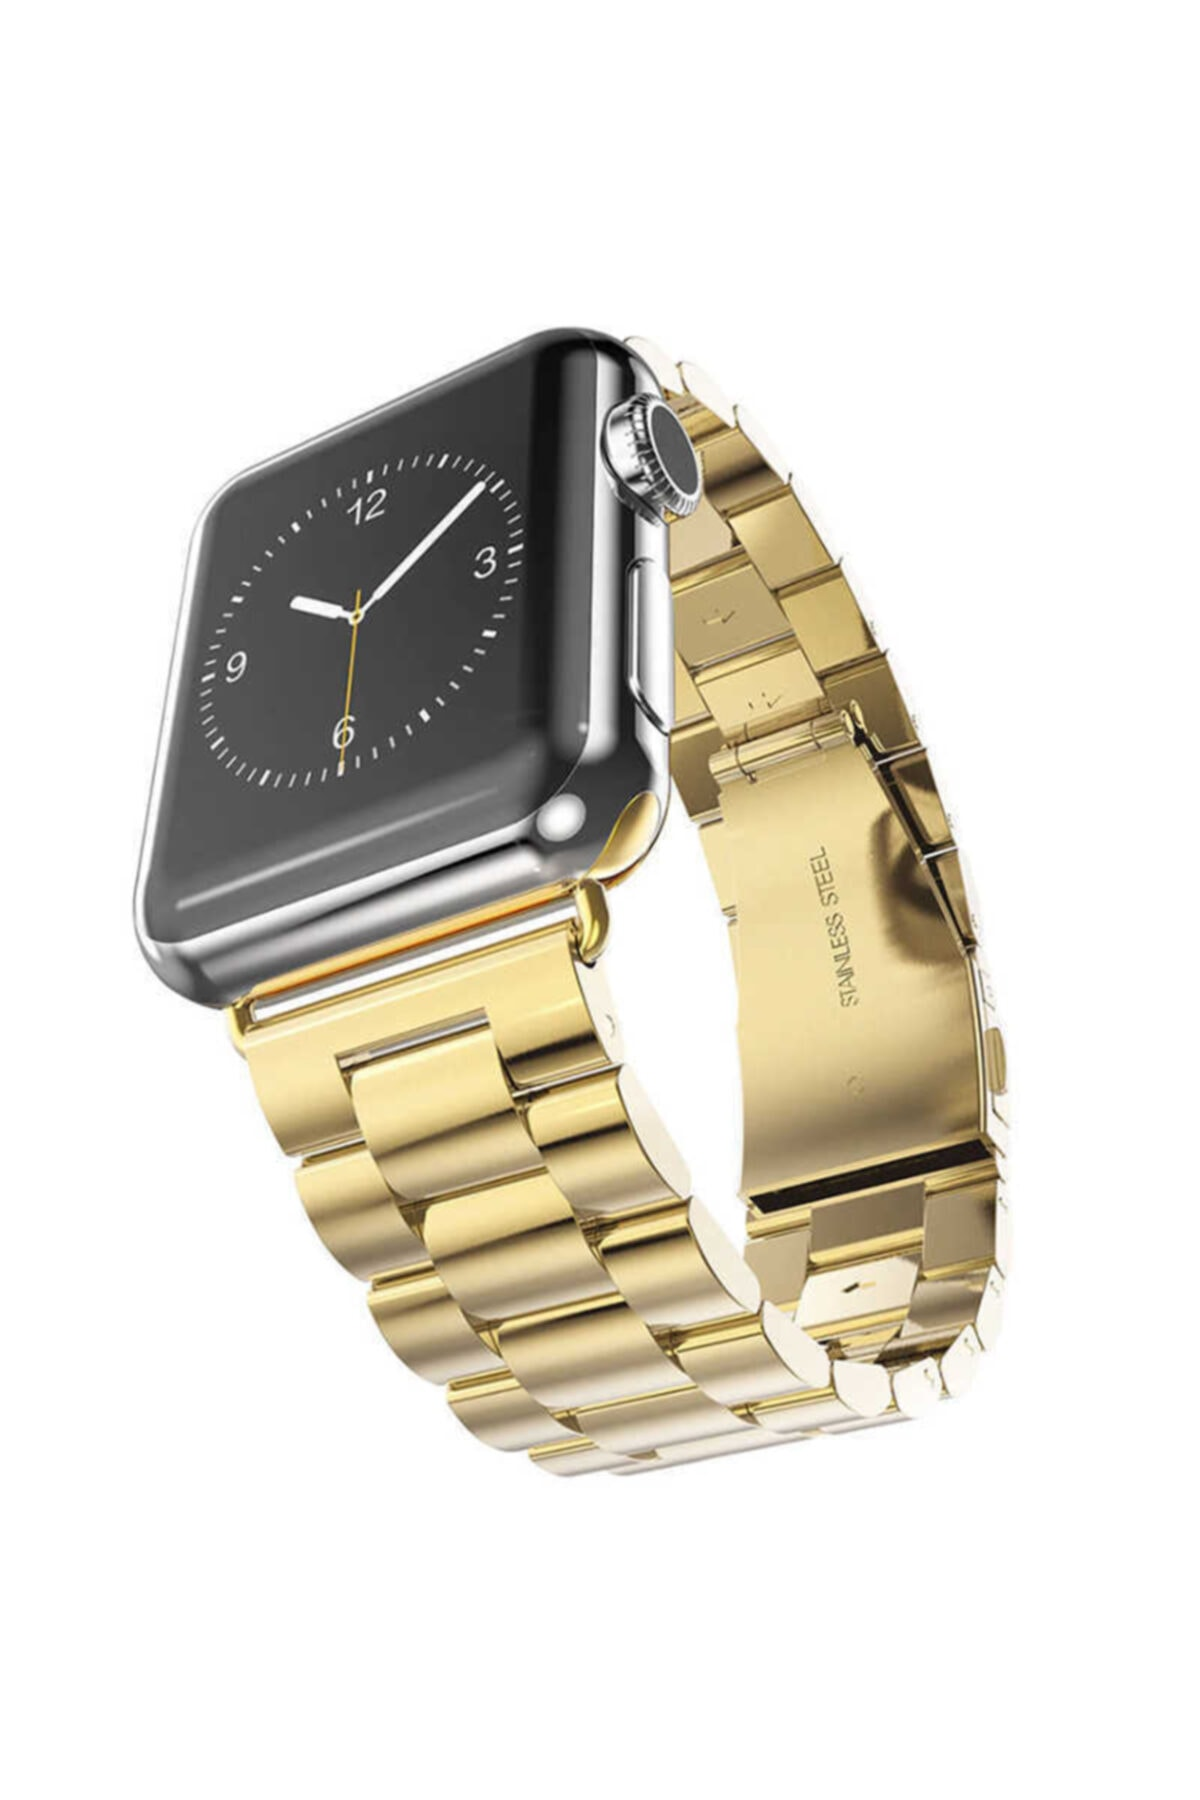 zore Apple Watch 1 2 3 4 5 6 Serisi 40mm Yandan Klipsli Ayarlanabilir Metal Kordon (krd-04) 1